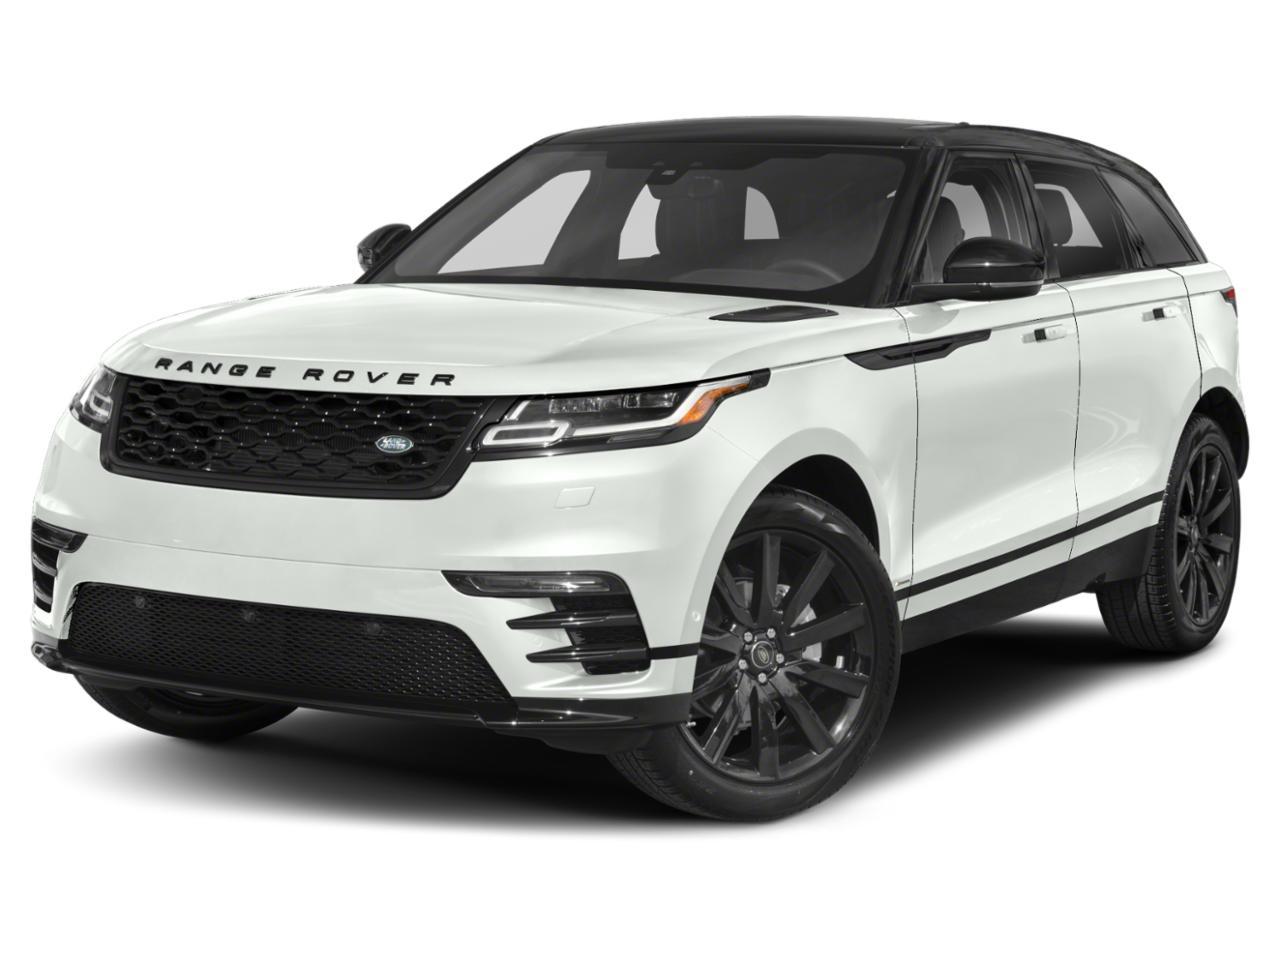 2020 Land Rover Range Rover Velar Vehicle Photo in Appleton, WI 54913